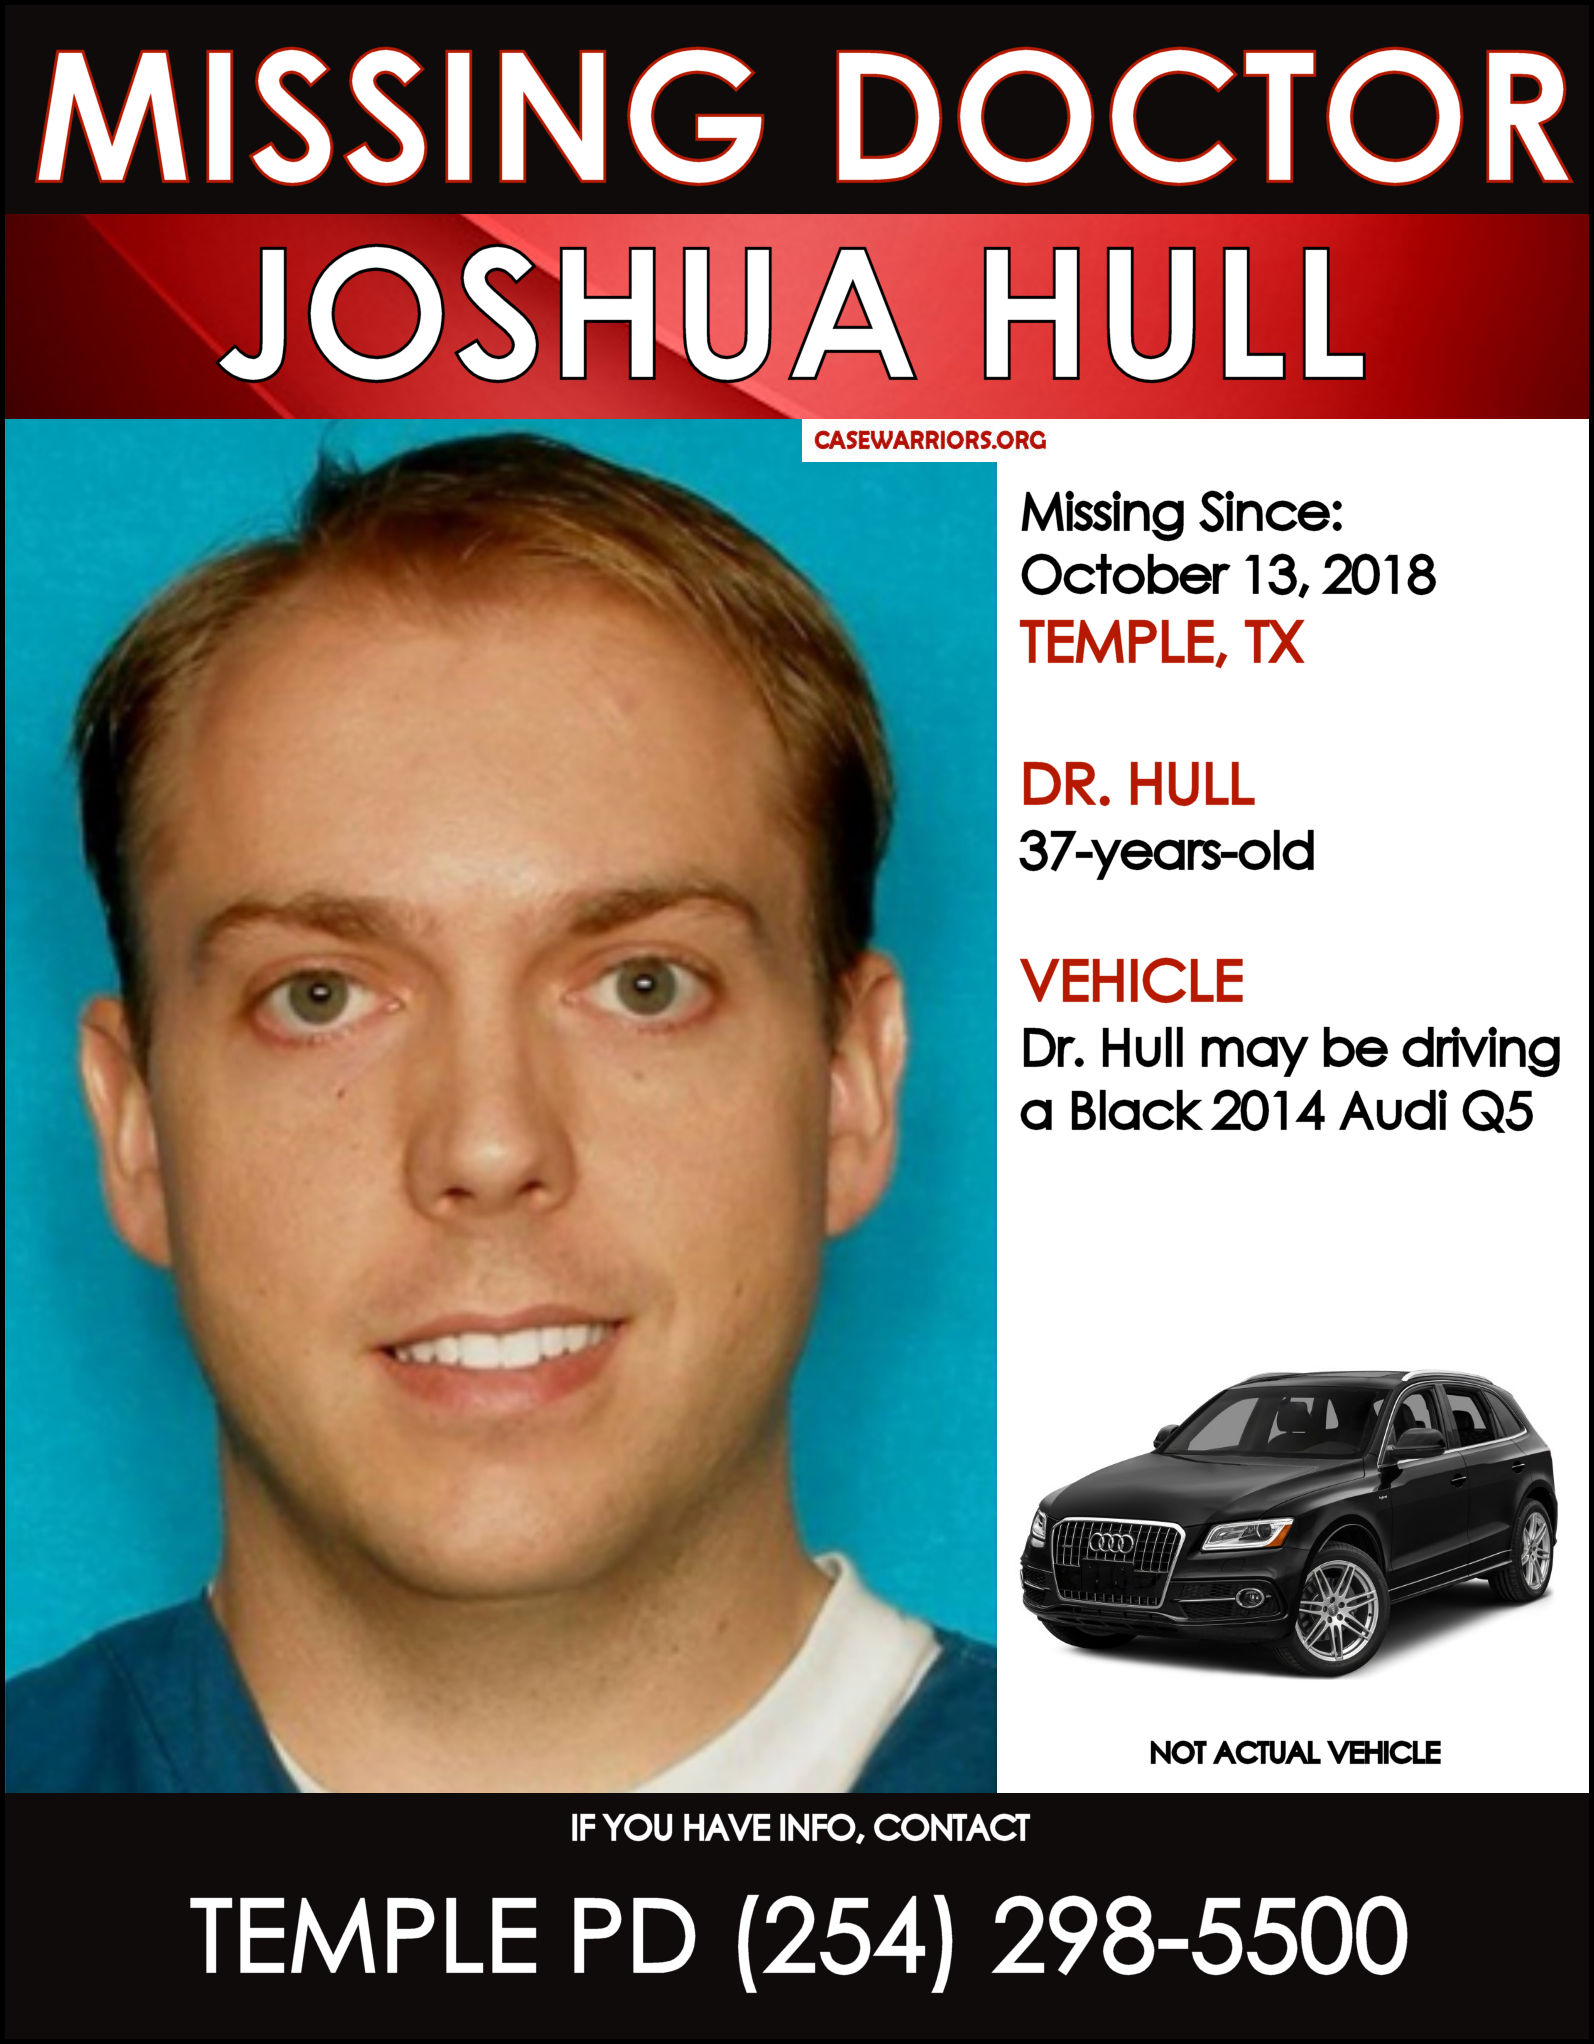 JOSHUA HULL